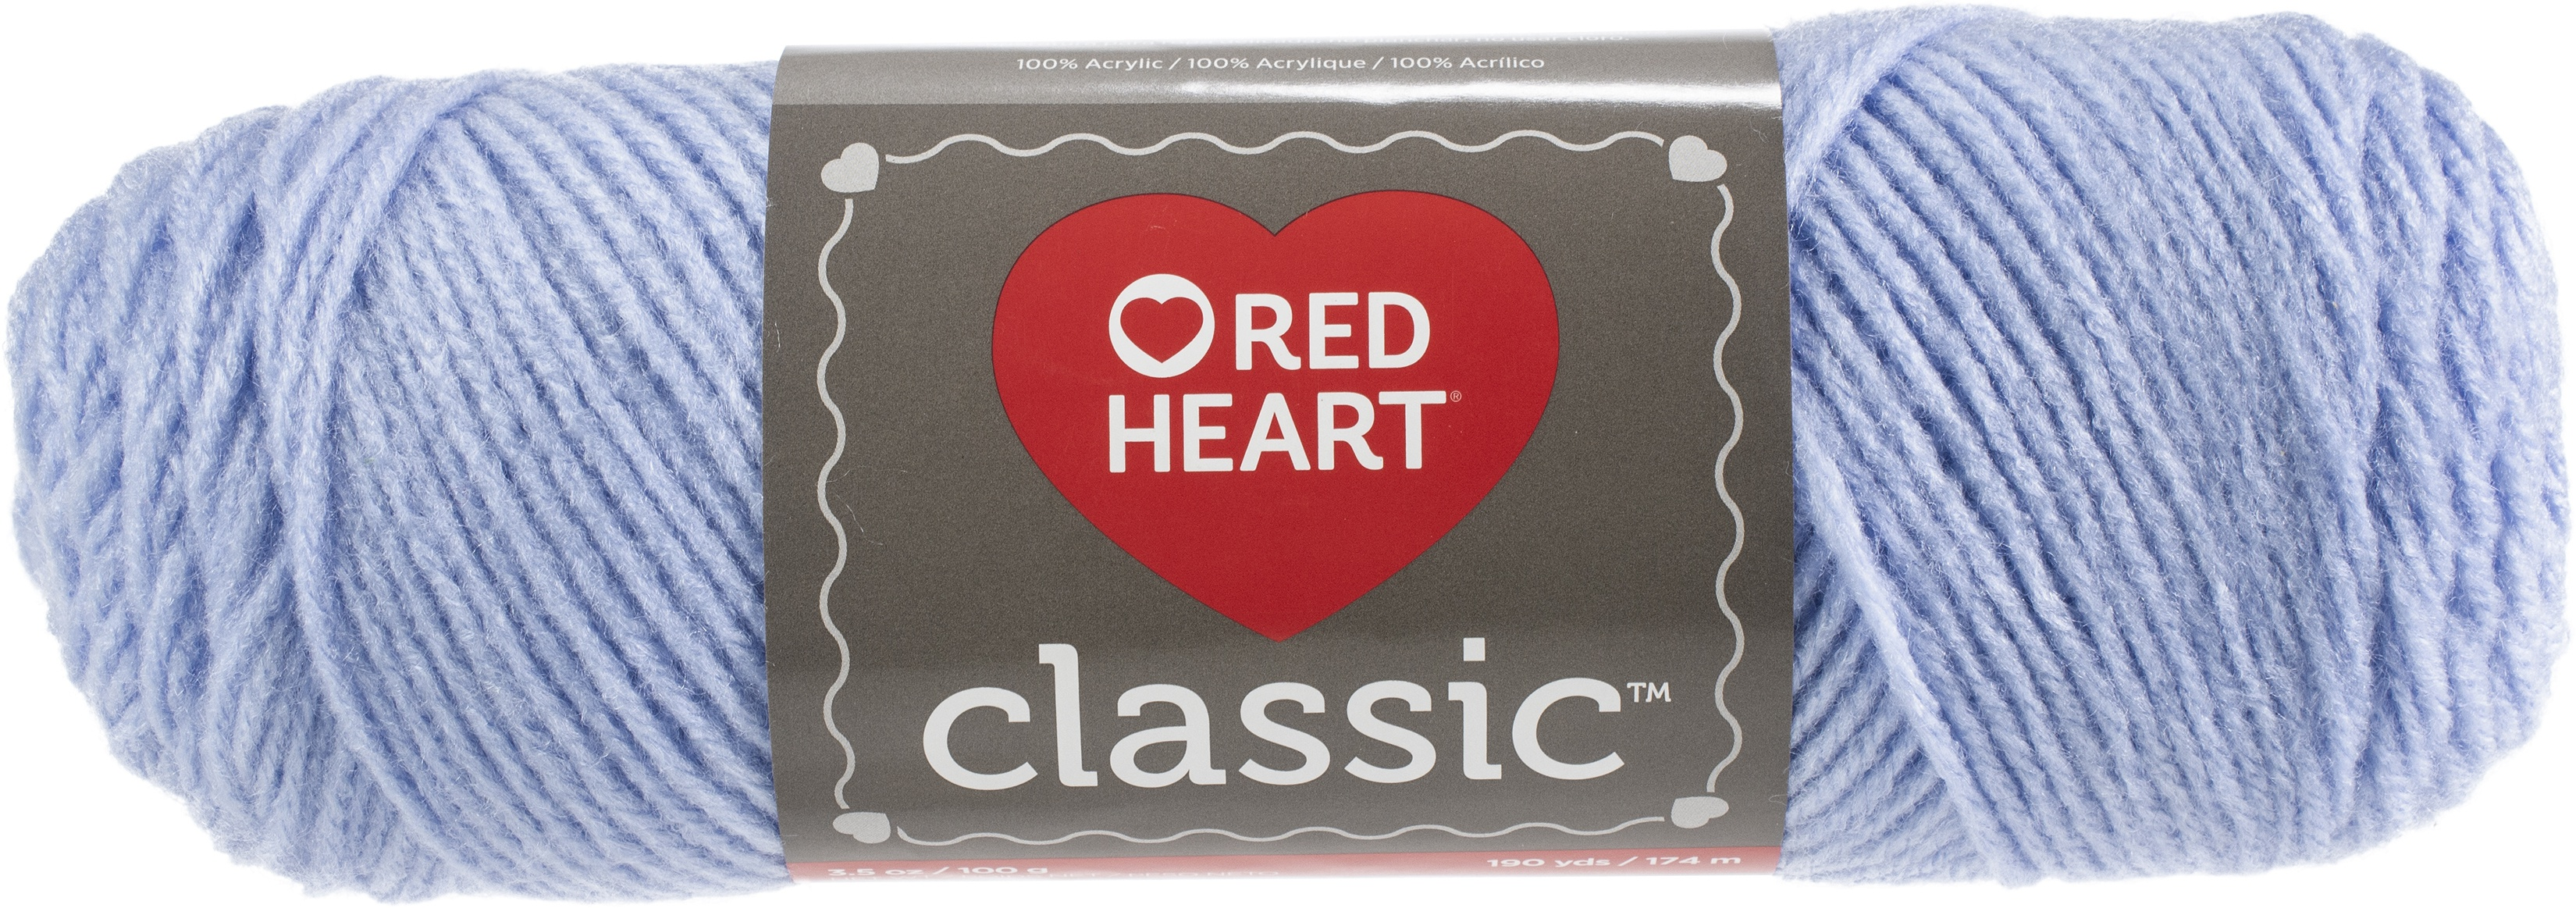 Red Heart Classic Yarn-Blue Jewel